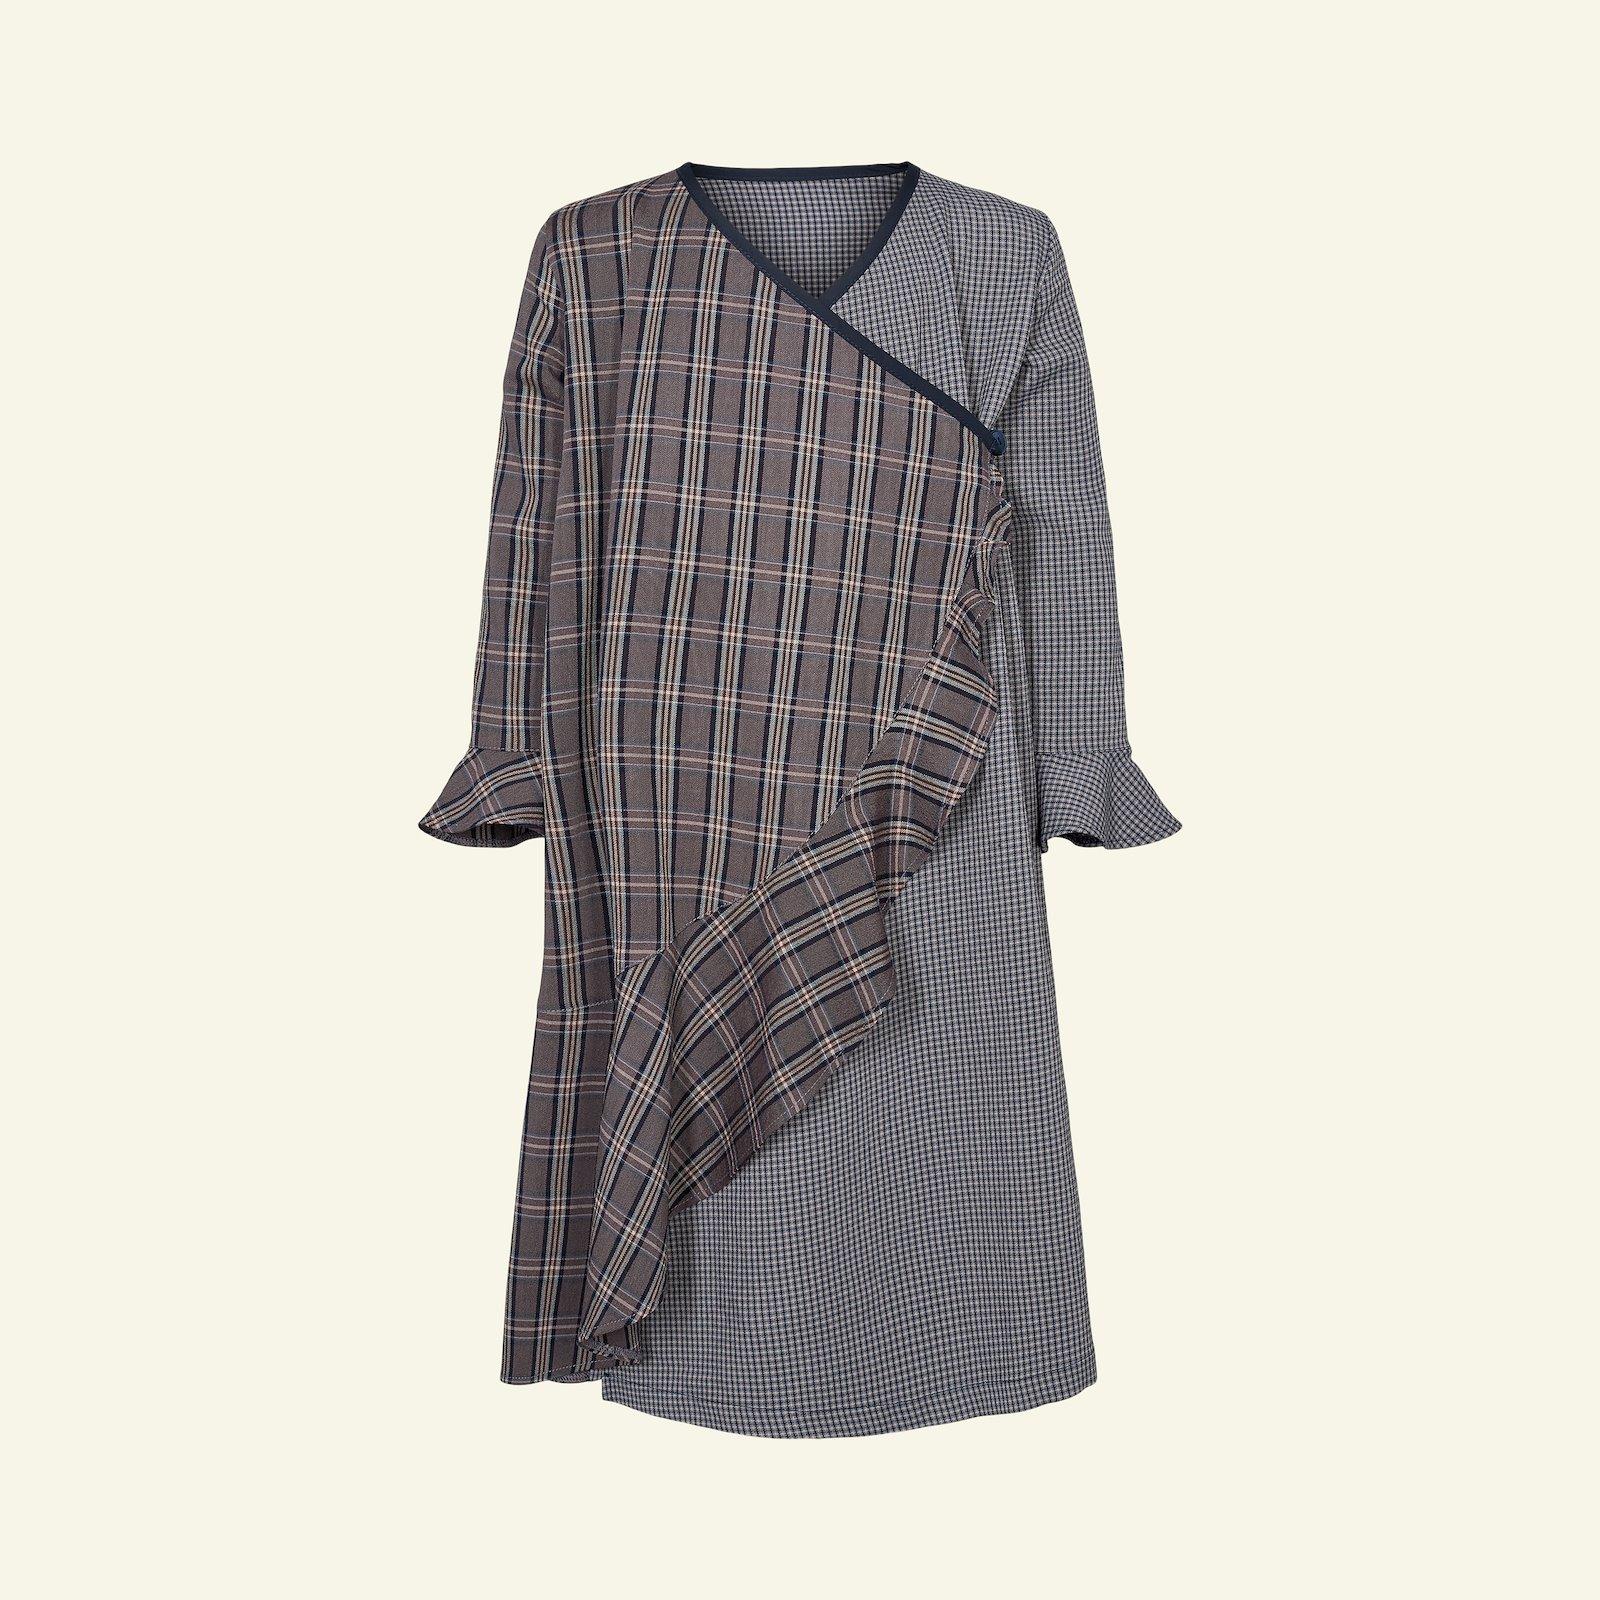 Wrap around dress p63067_300219_300220_64082_33459_sskit